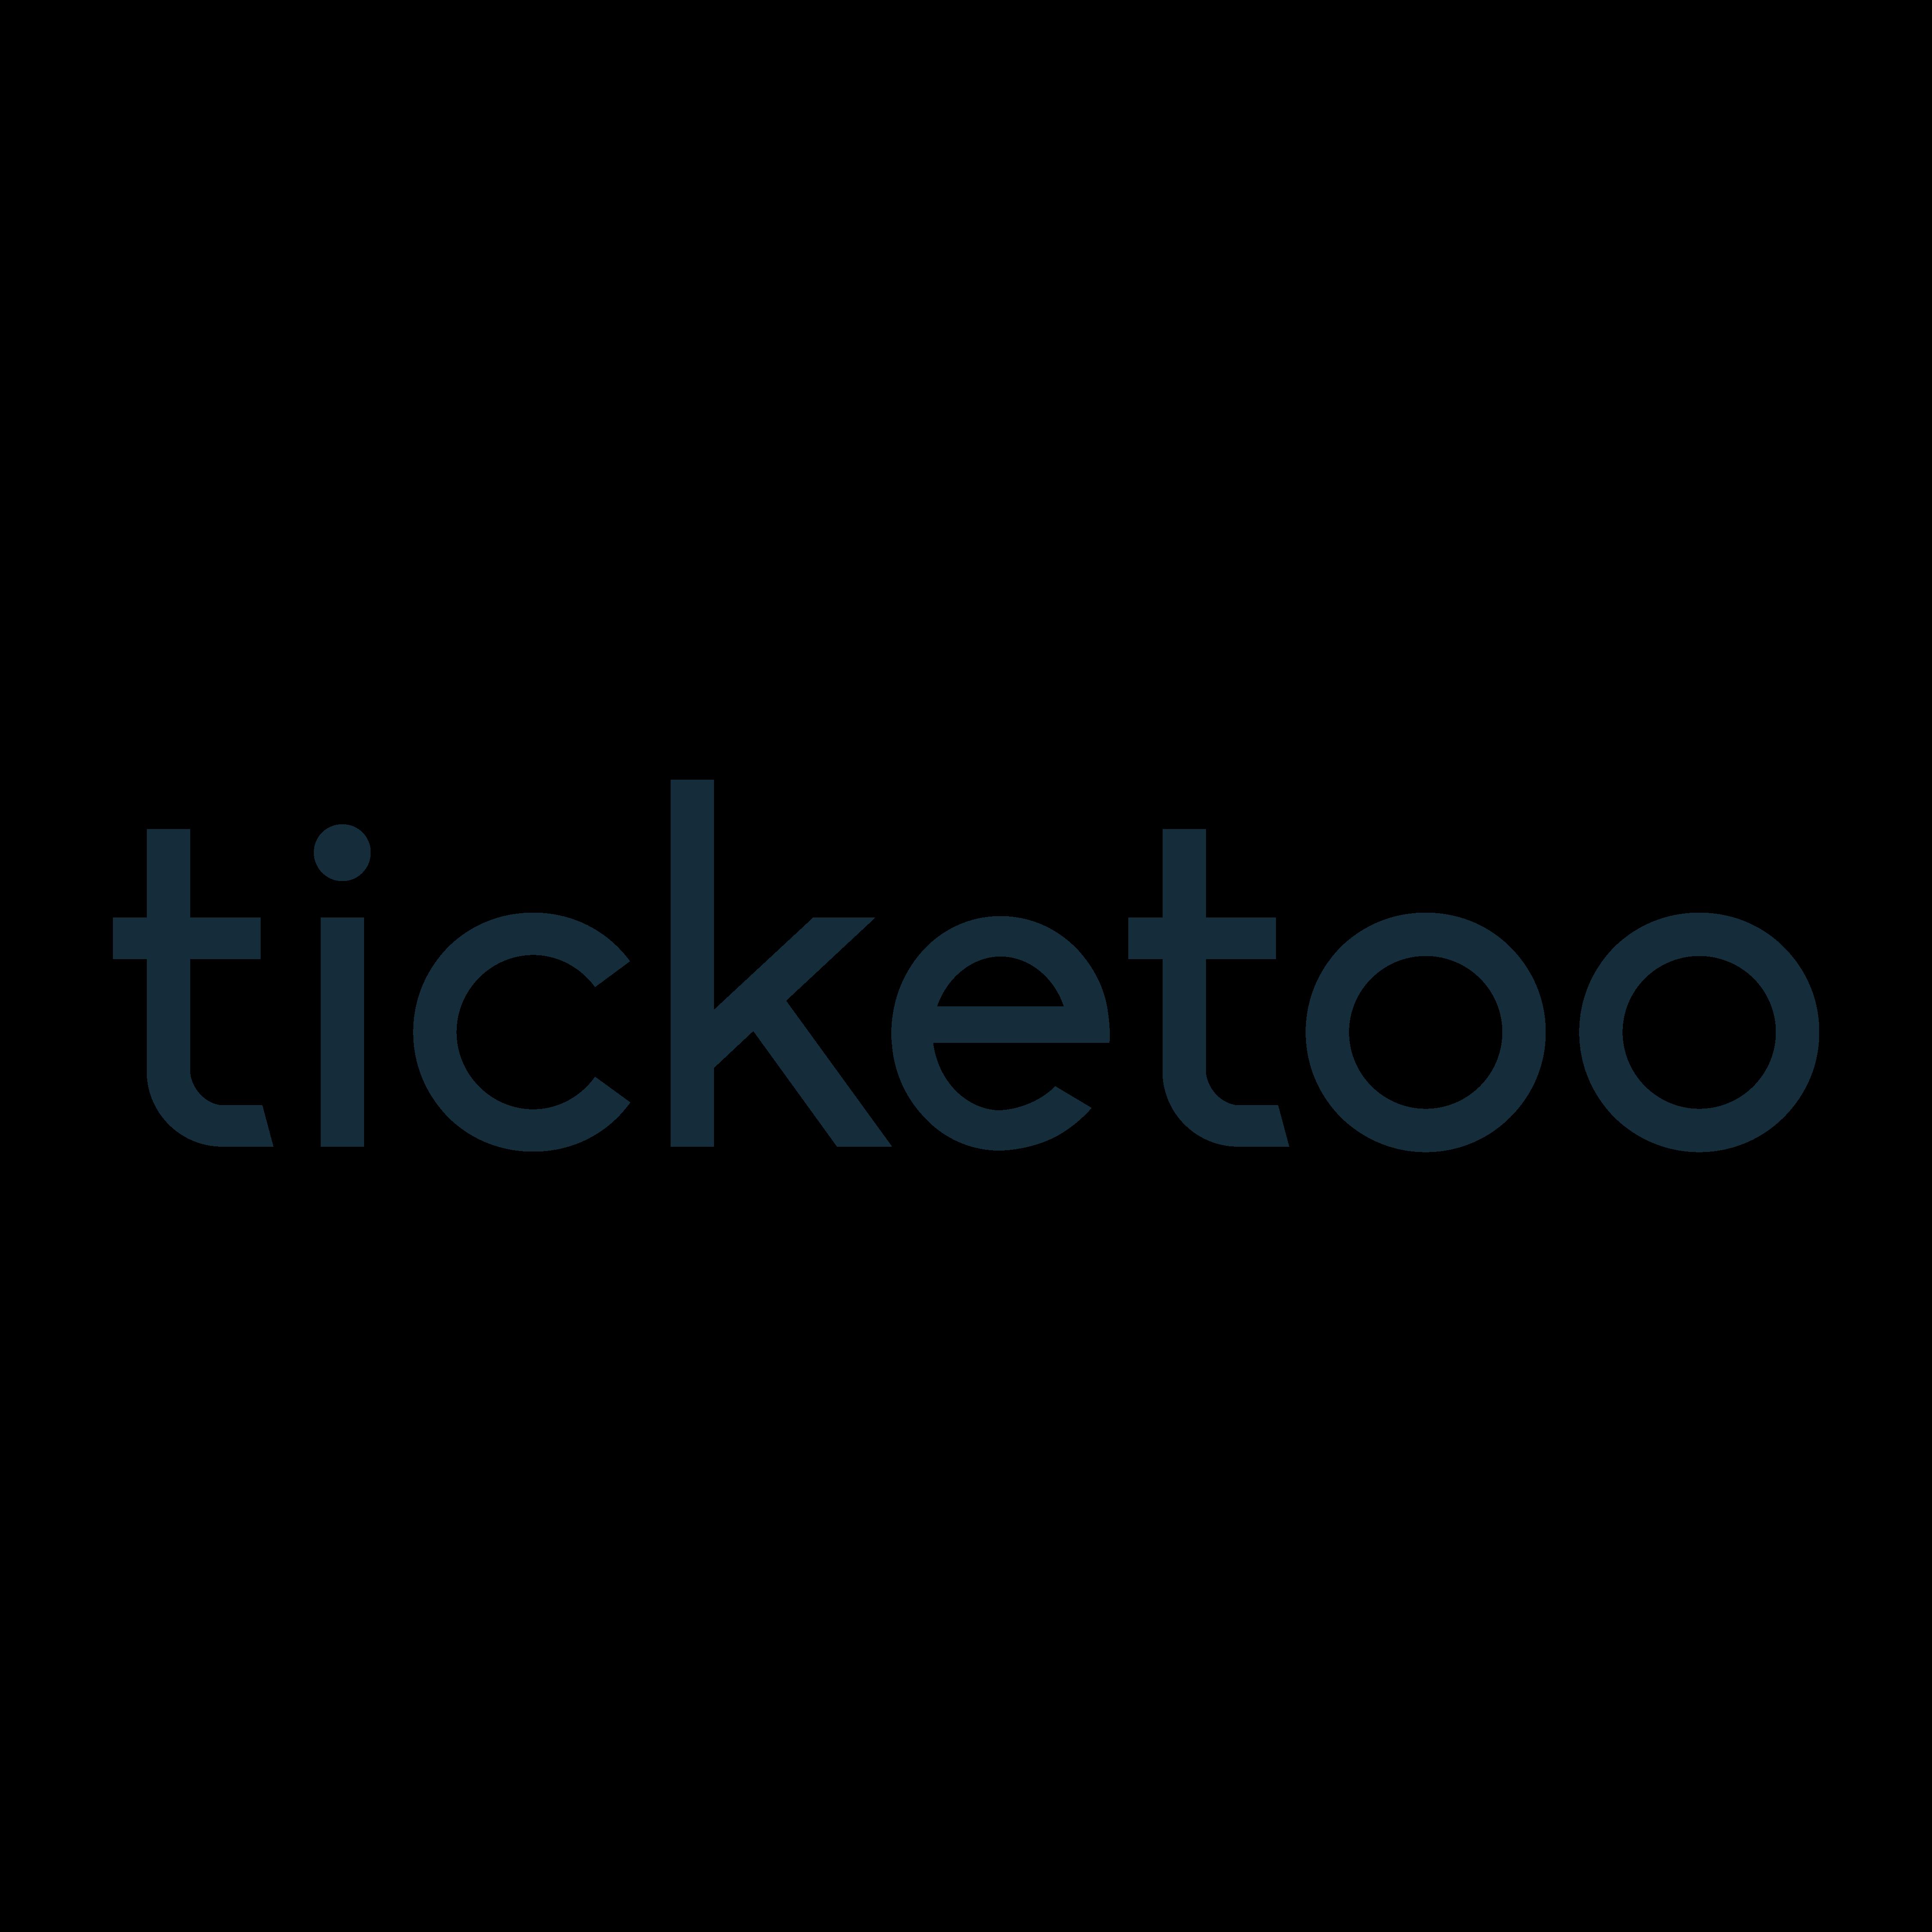 Ticketoo